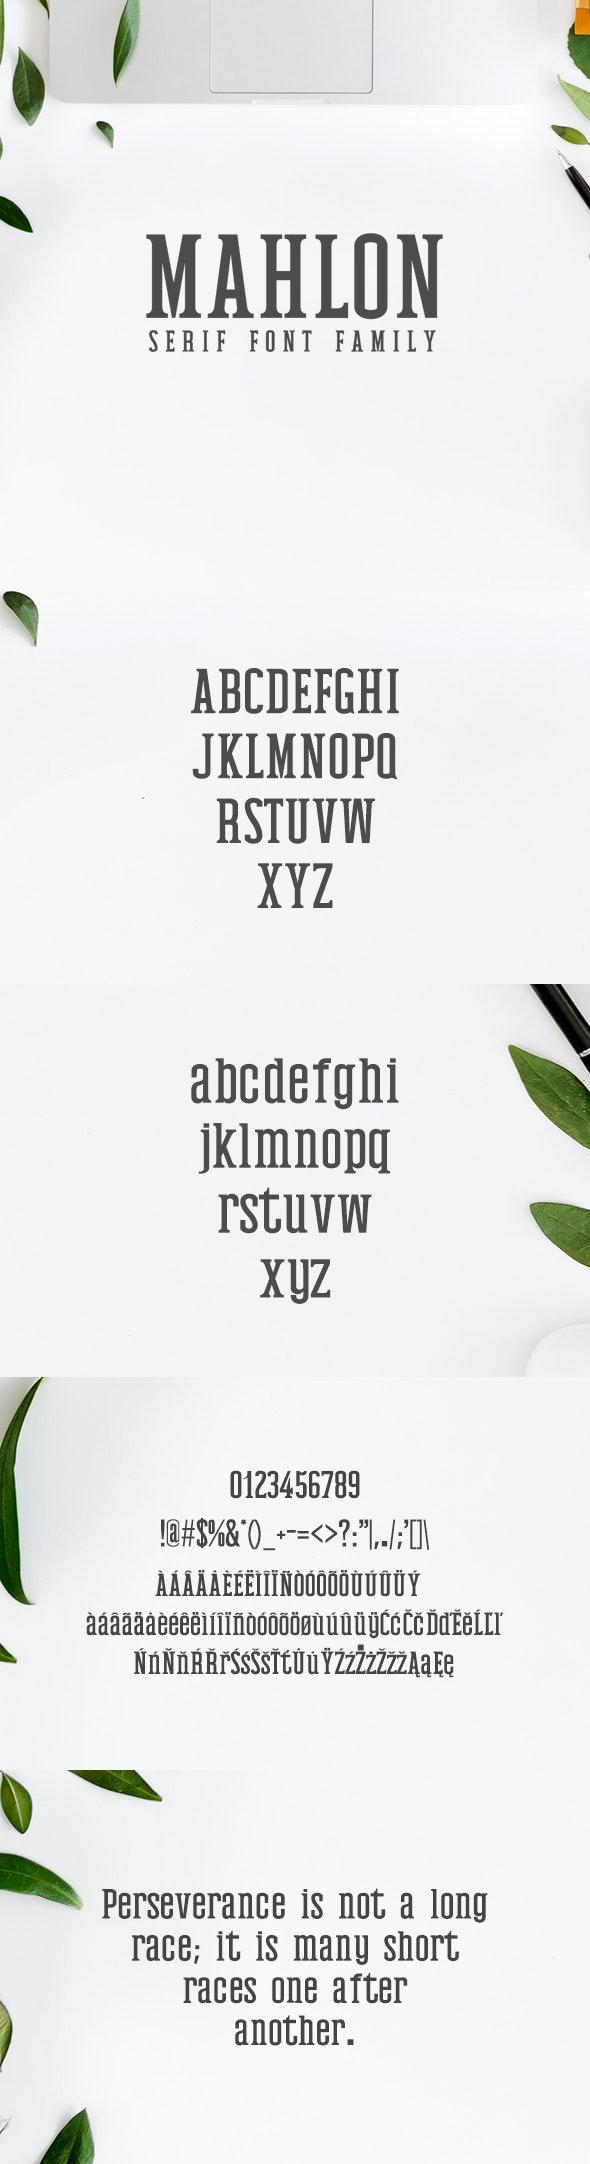 Mahlon Serif 3 Font Family Pack - Serif Fonts